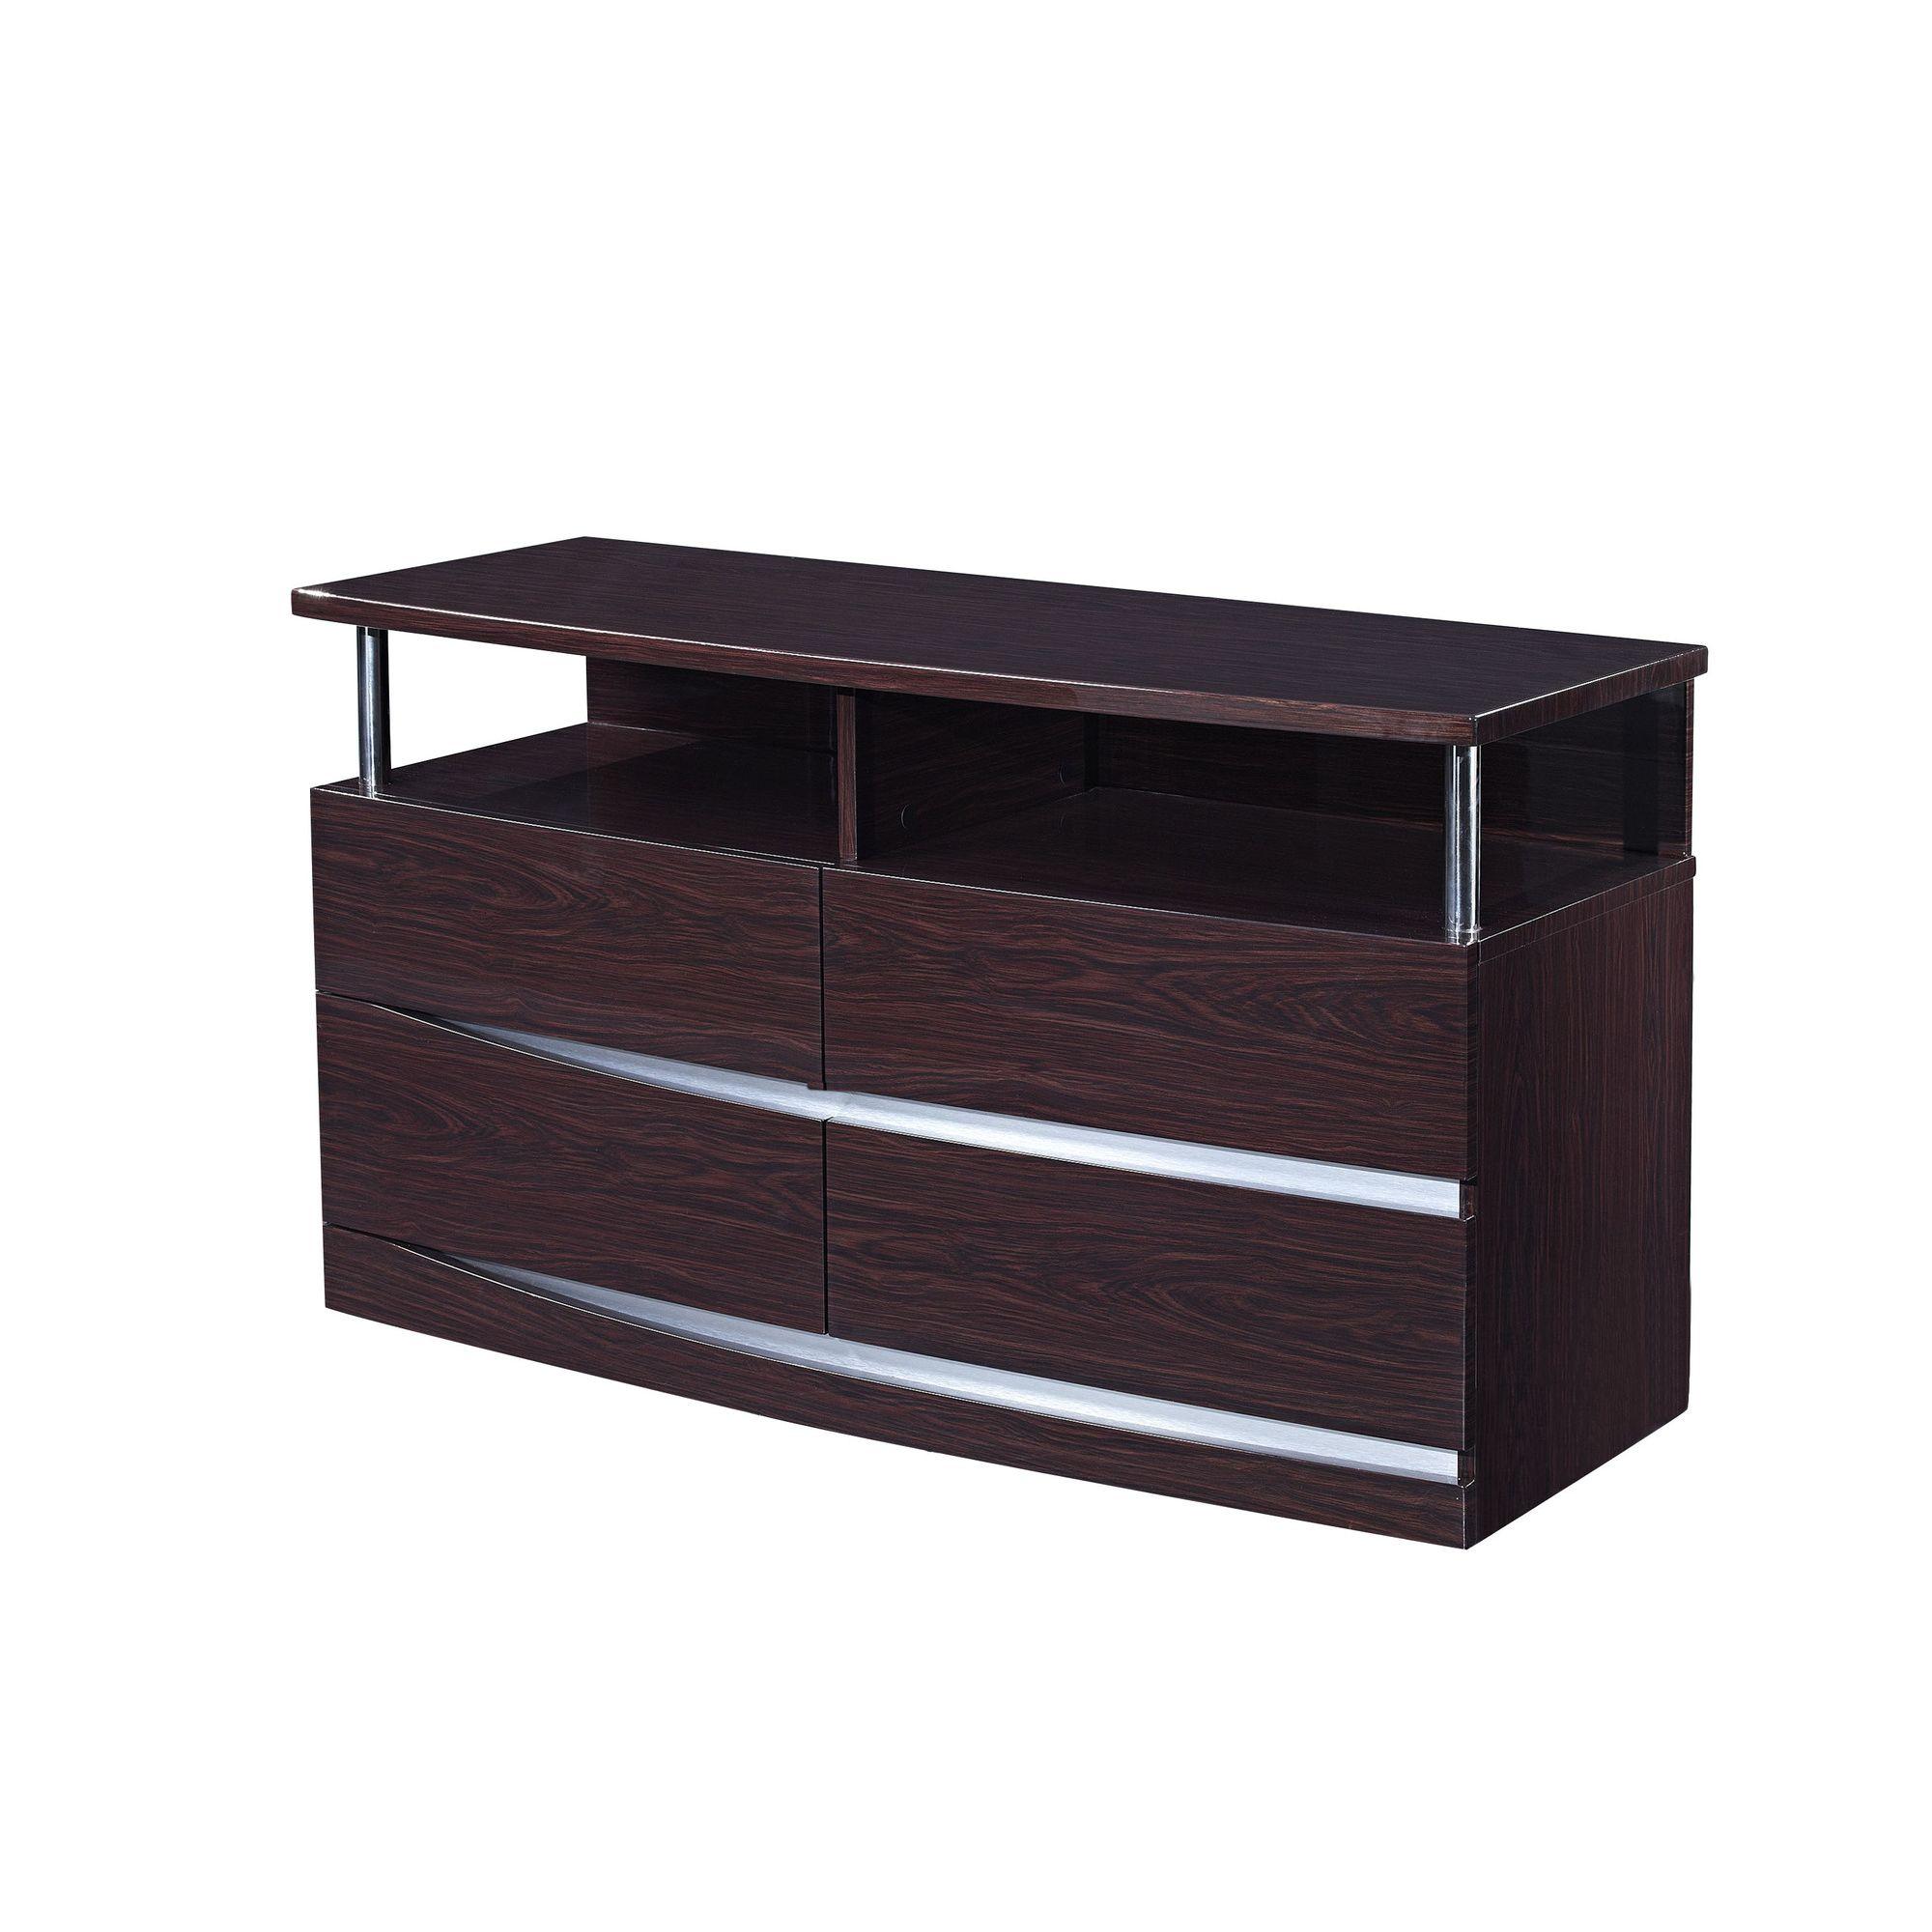 Furniture Link Plaza 4 Drawer Cabinet - Walnut at Tesco Direct